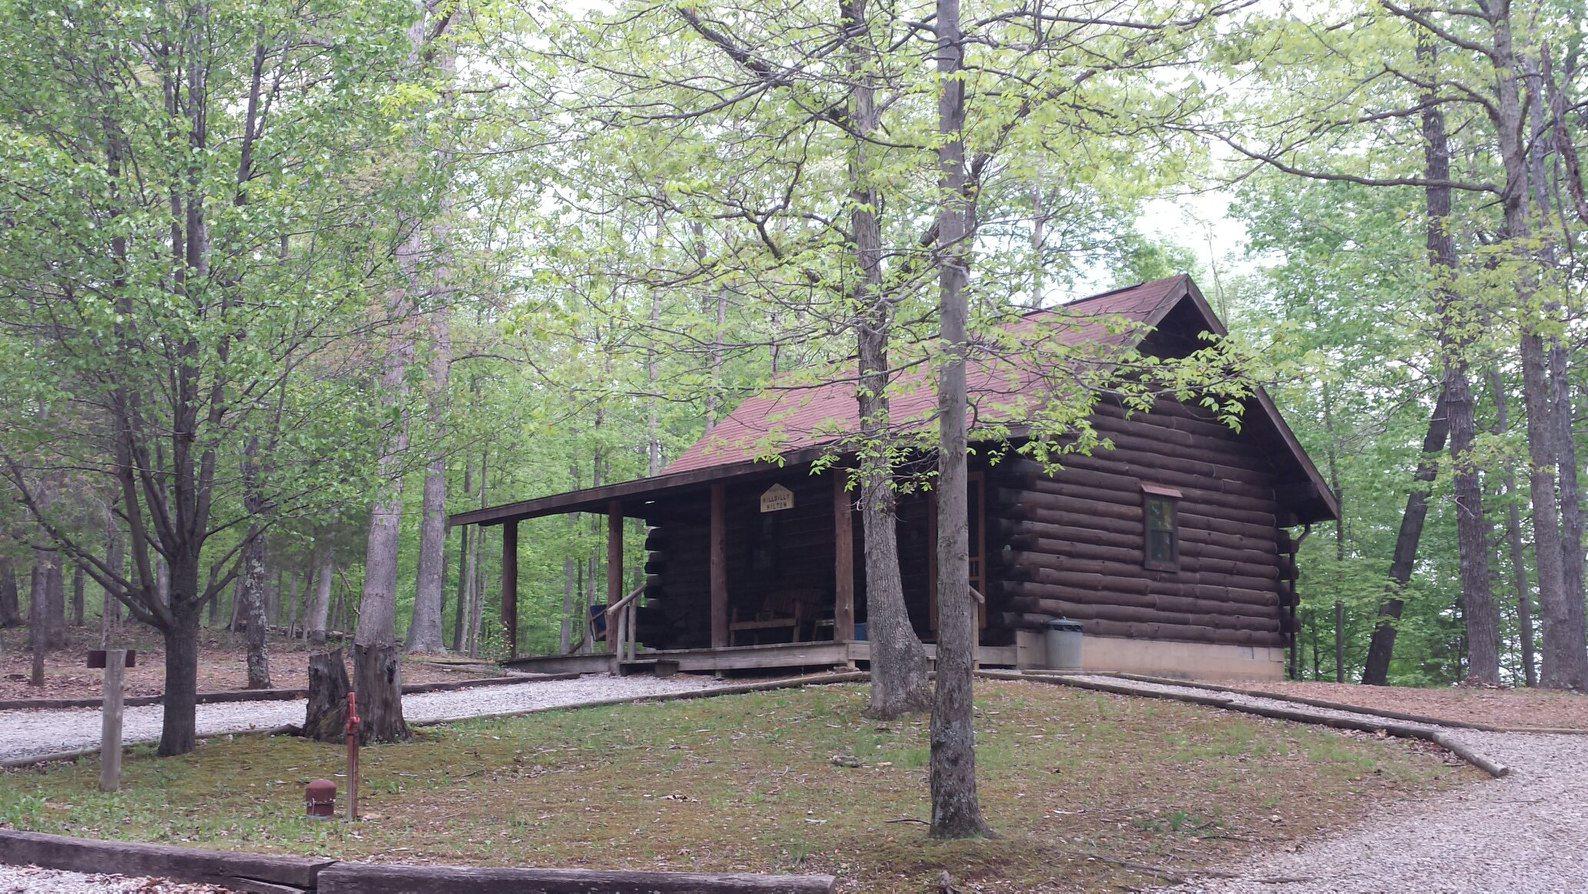 High Ridge Log Cabin Rentals 812-595-8088 Mauckport, IN